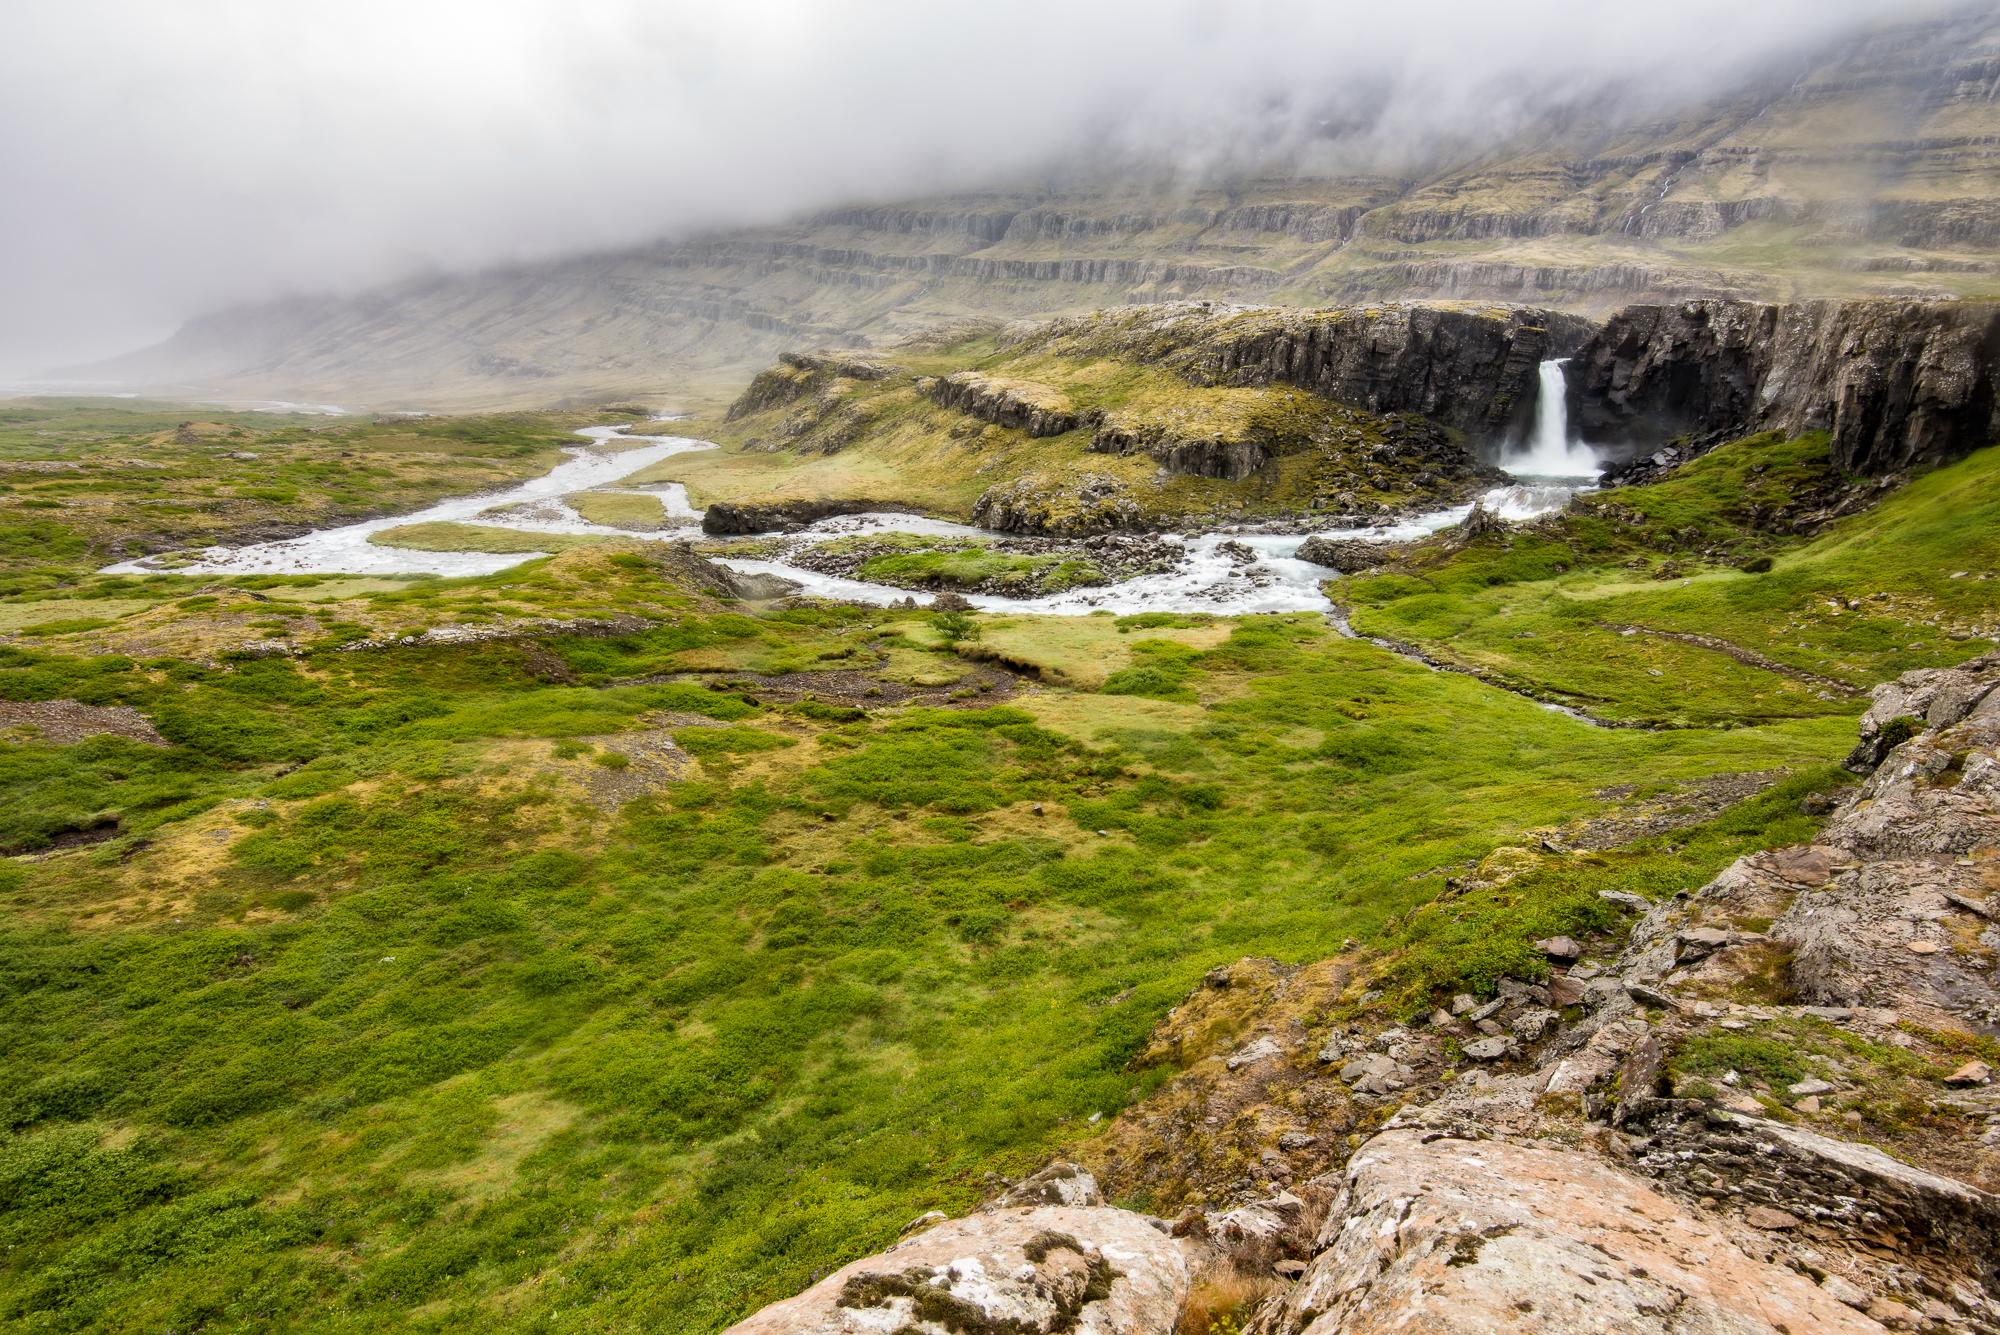 Somewhere between Djúpivogur and Egilsstaðir, Iceland  Nikon D810 + Nikon 16-35mm f/4VR